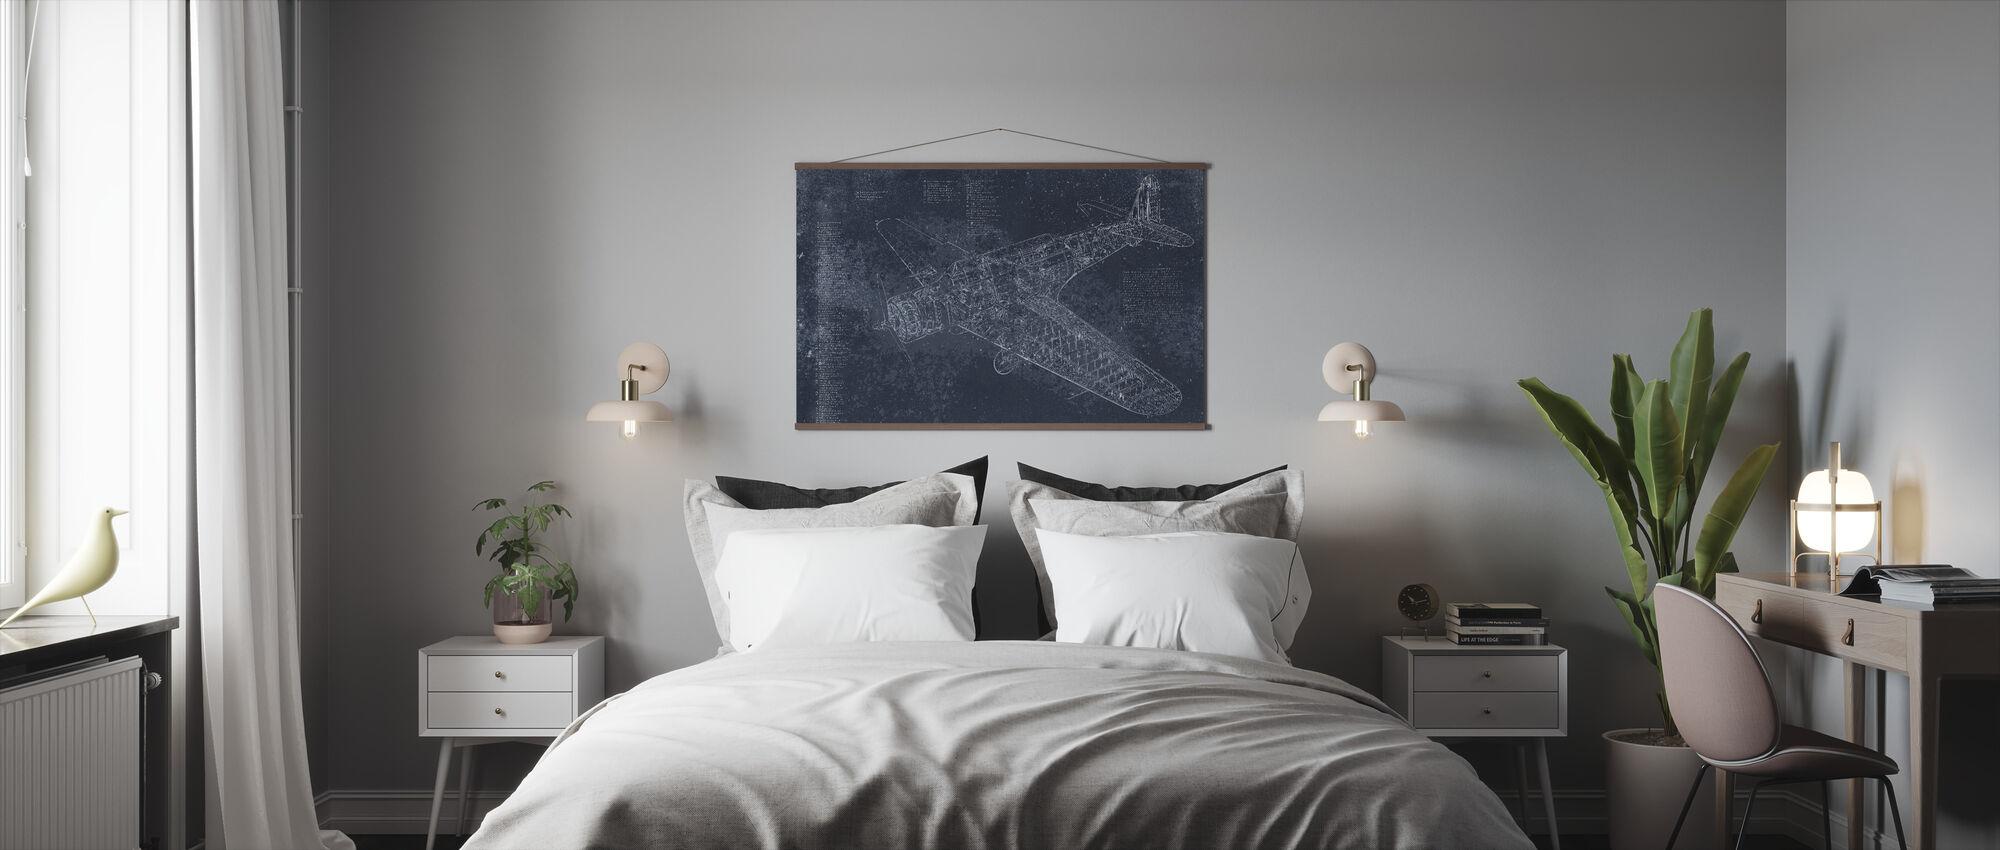 Retro Airplane - Dark Blue - Poster - Bedroom